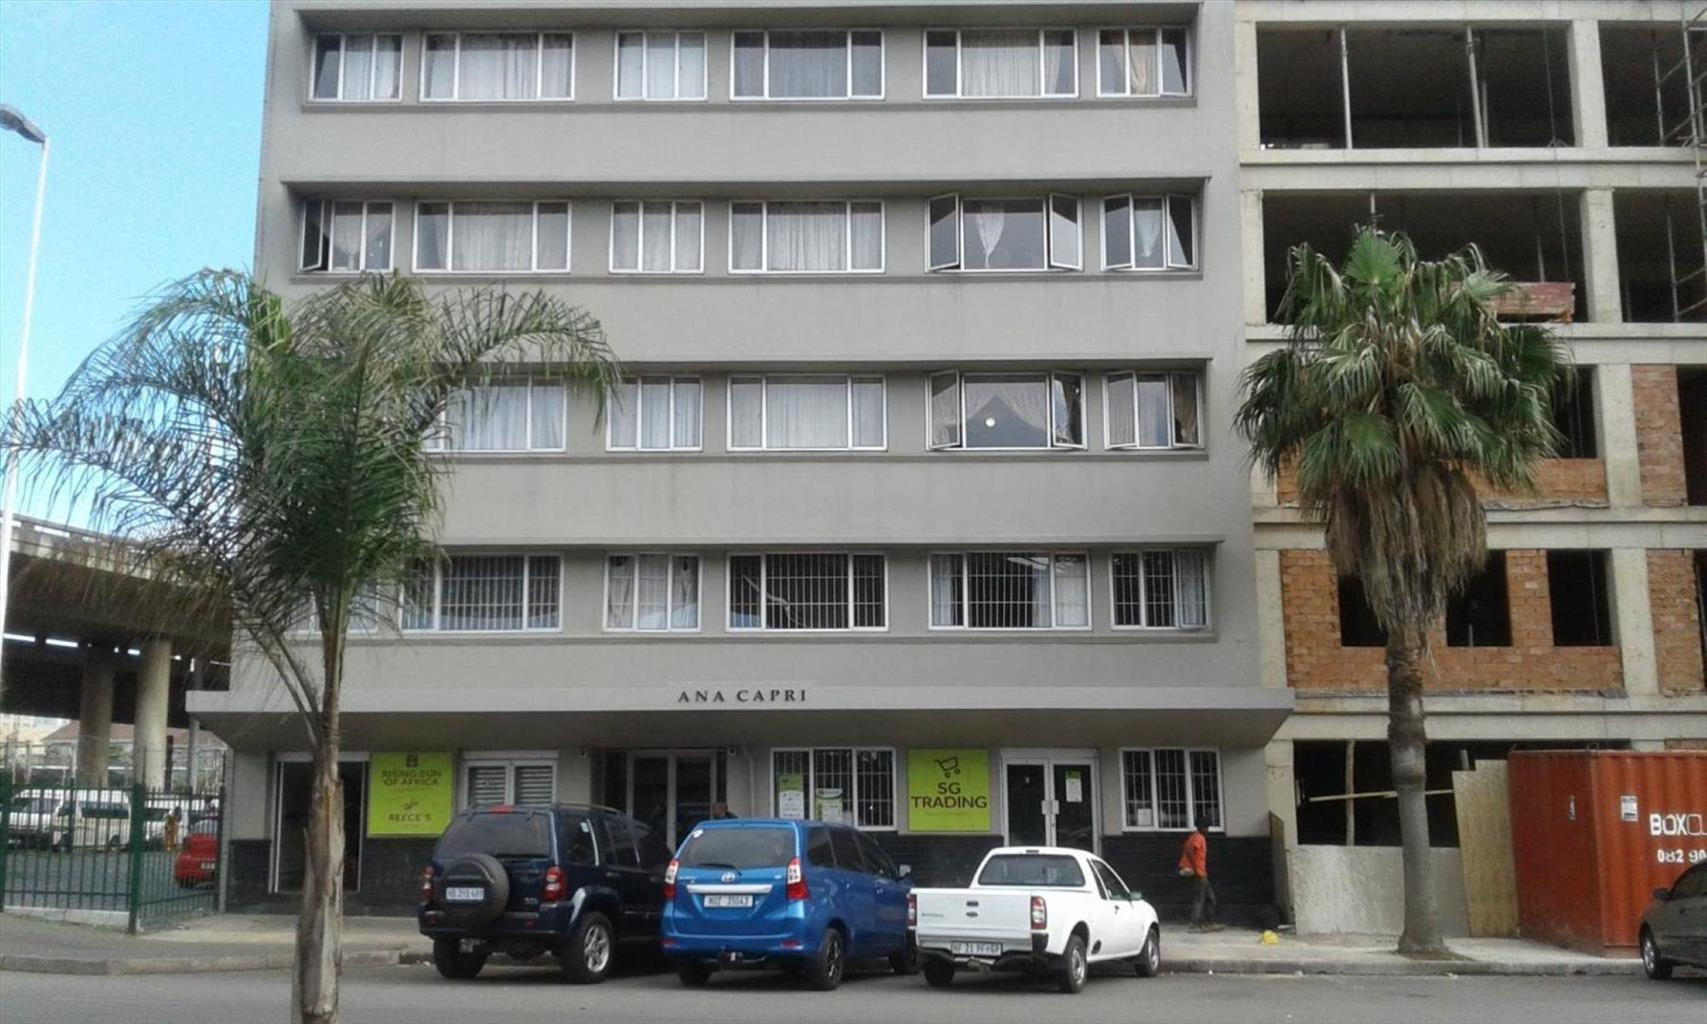 Retail Rental Monthly in Durban Central